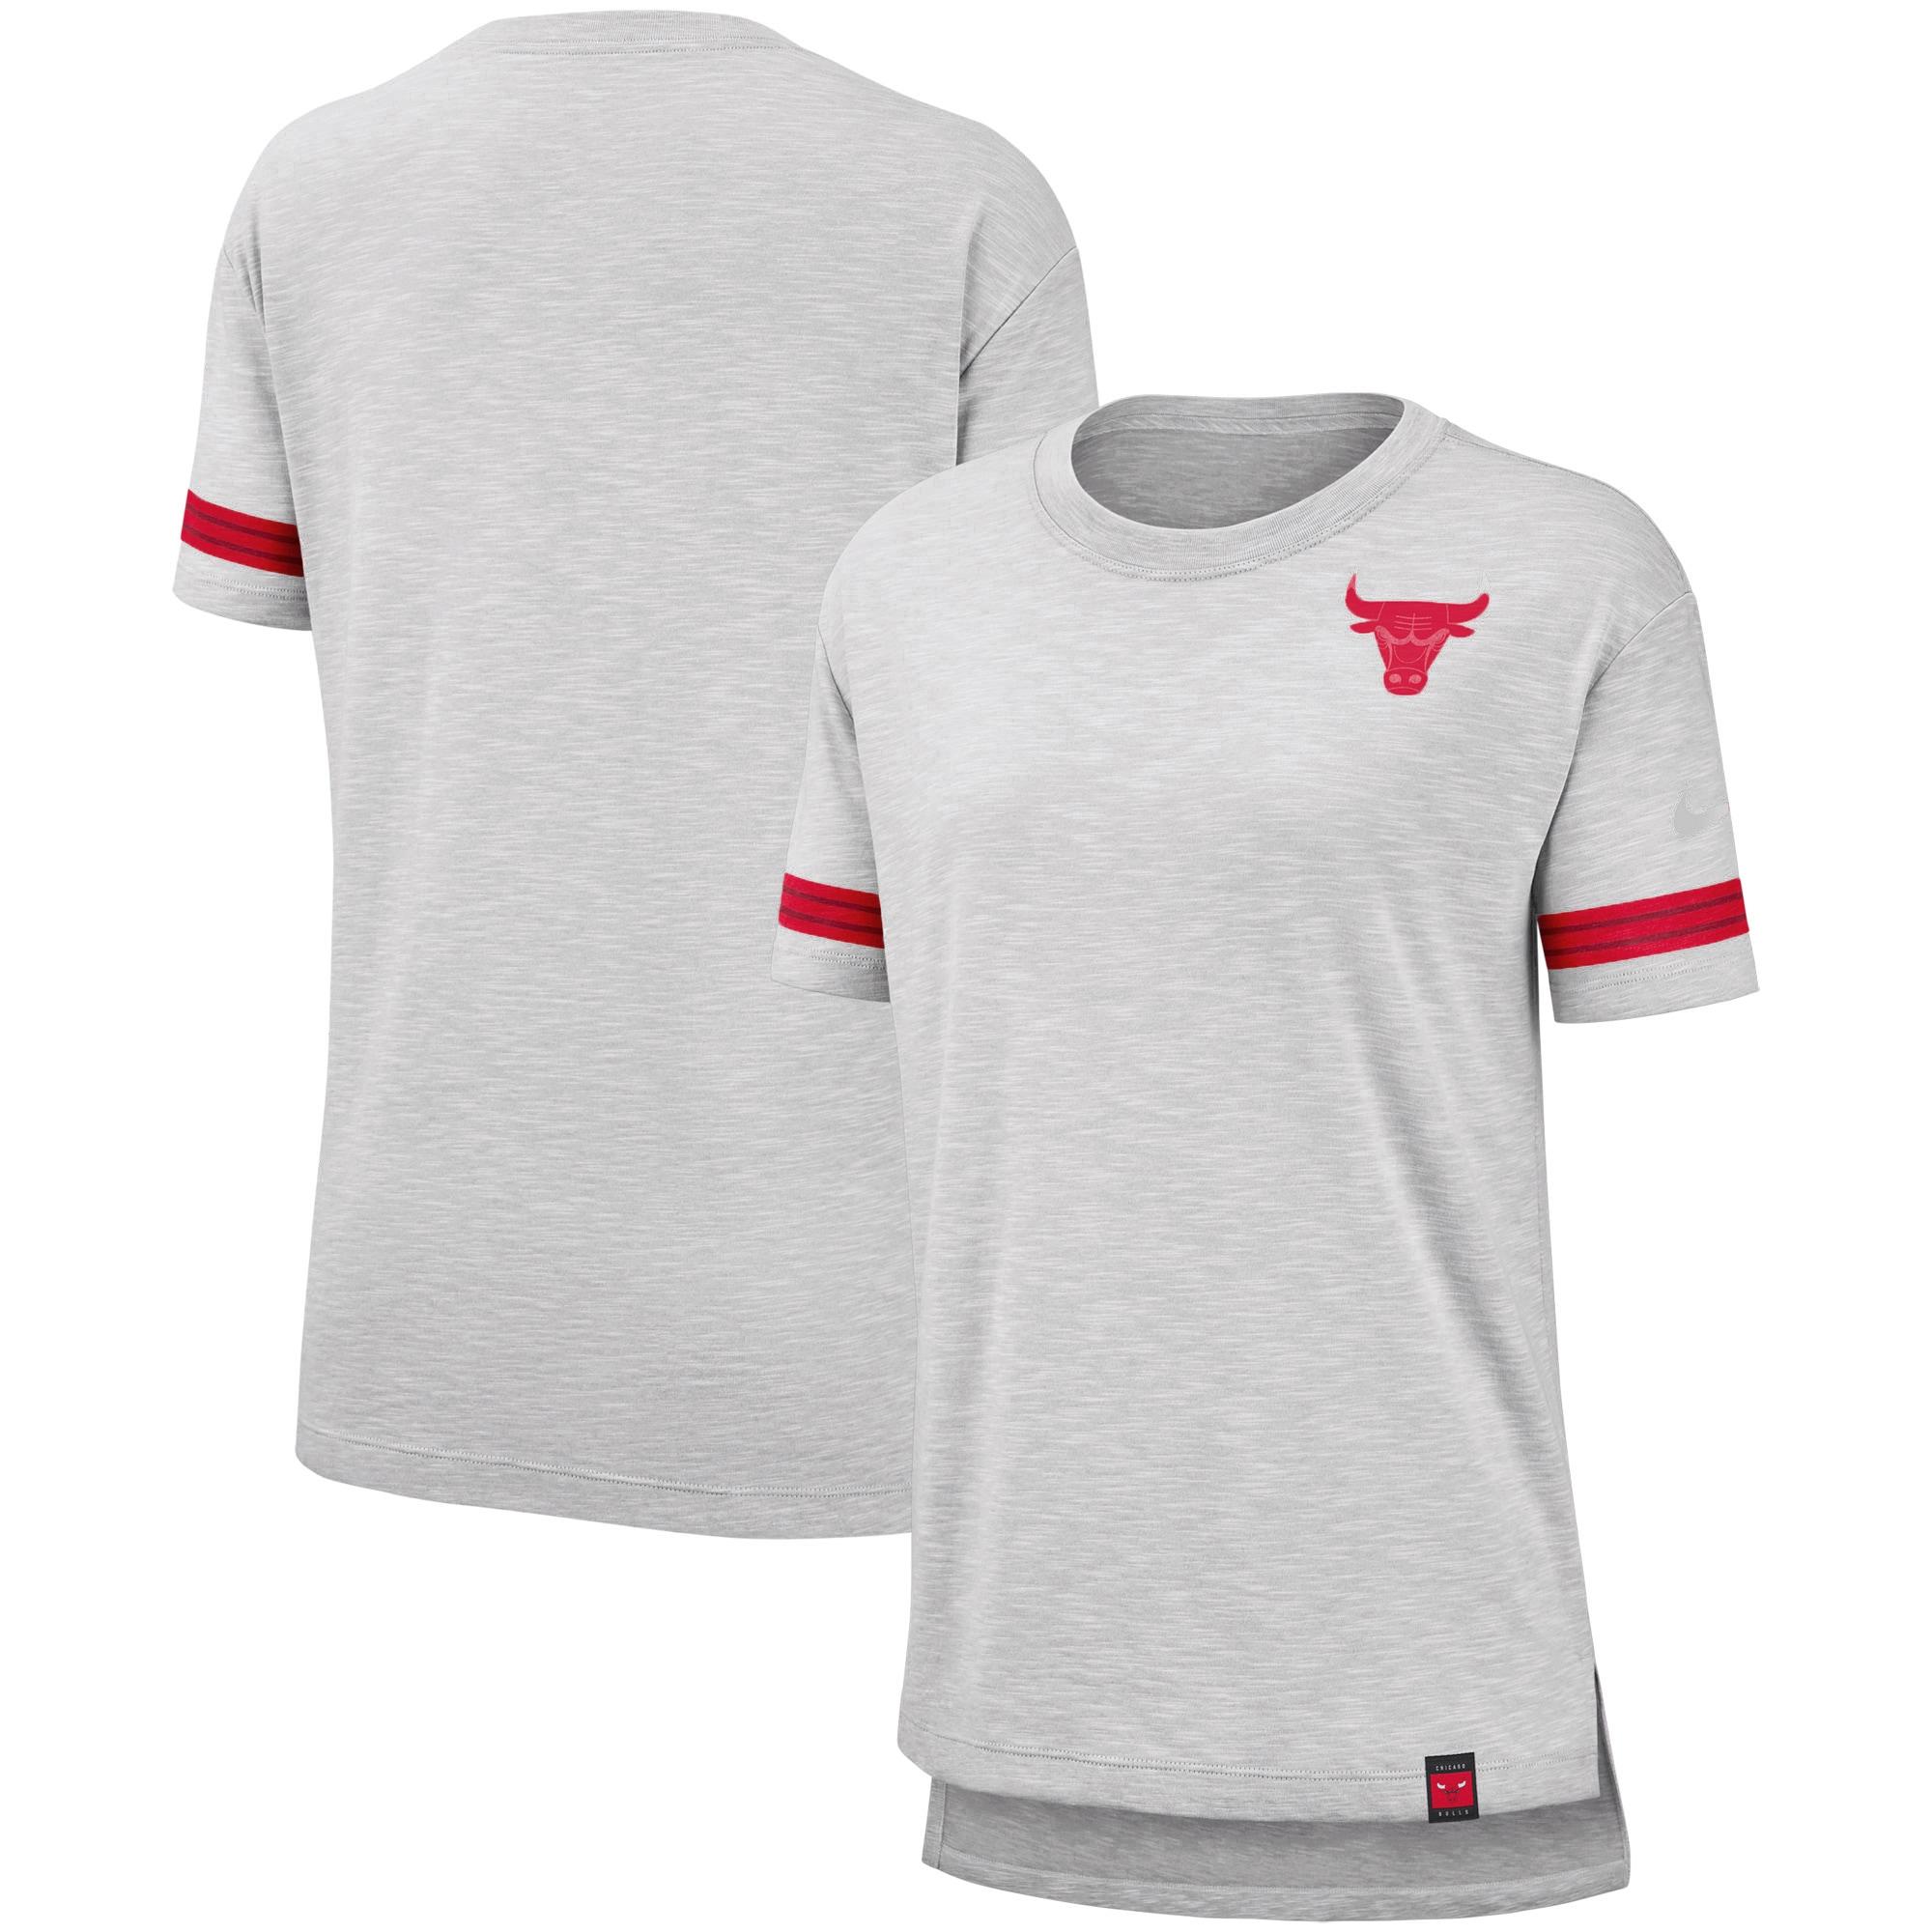 Chicago Bulls Nike Women's Color Rush Sleeve Stripe Slub T-Shirt - Heathered Gray